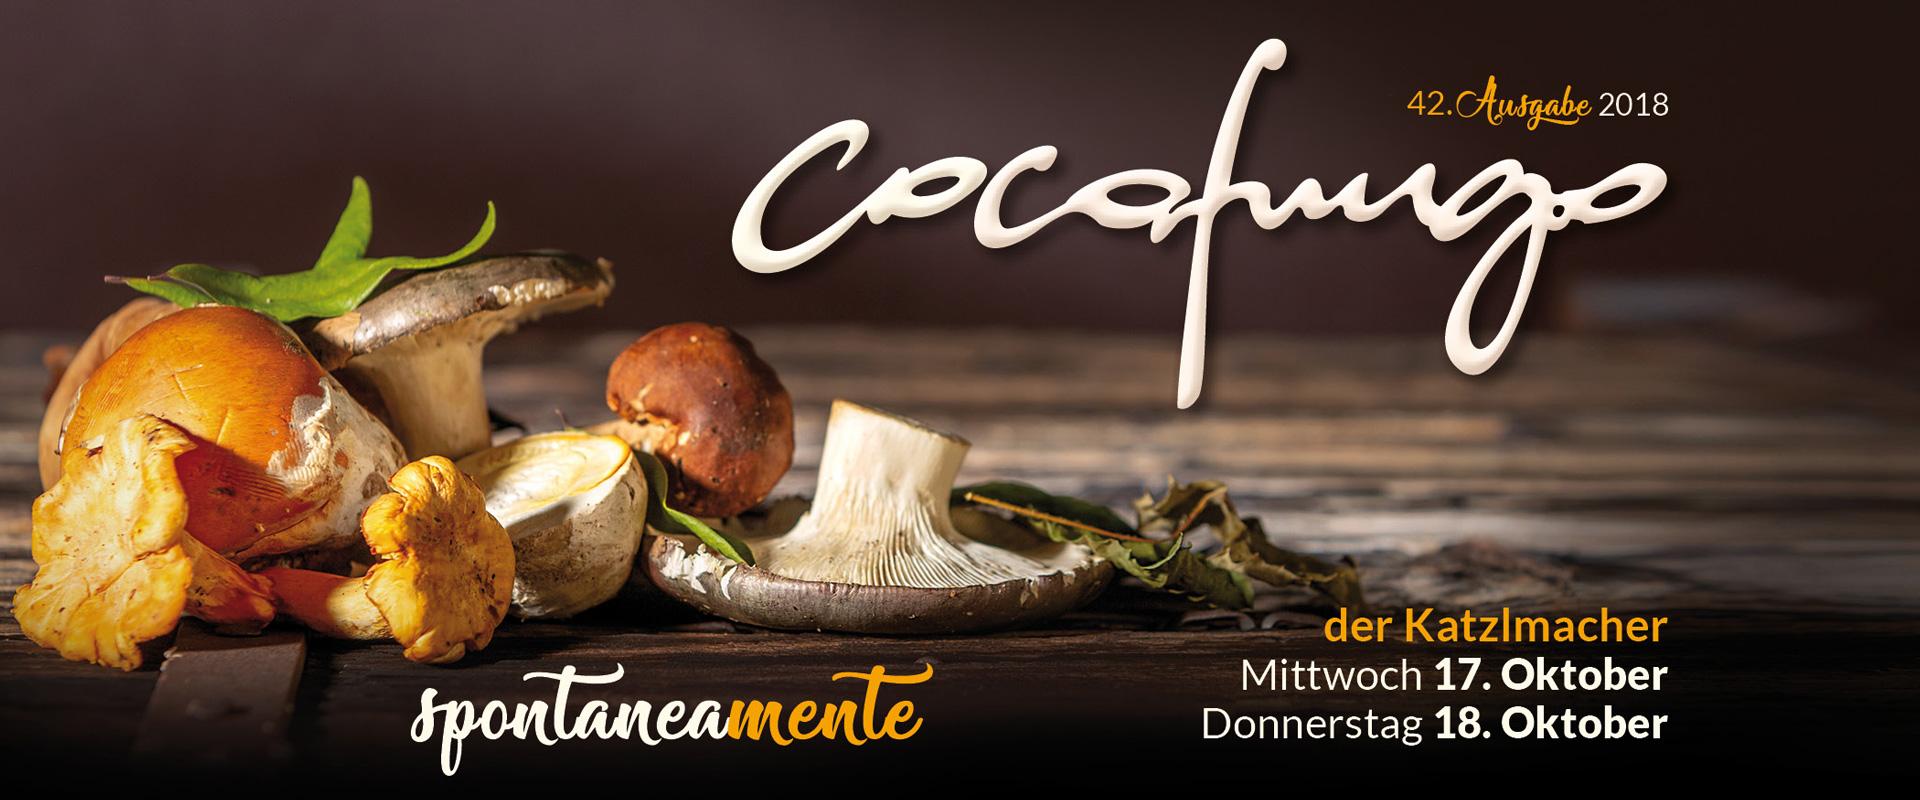 CocoFungo